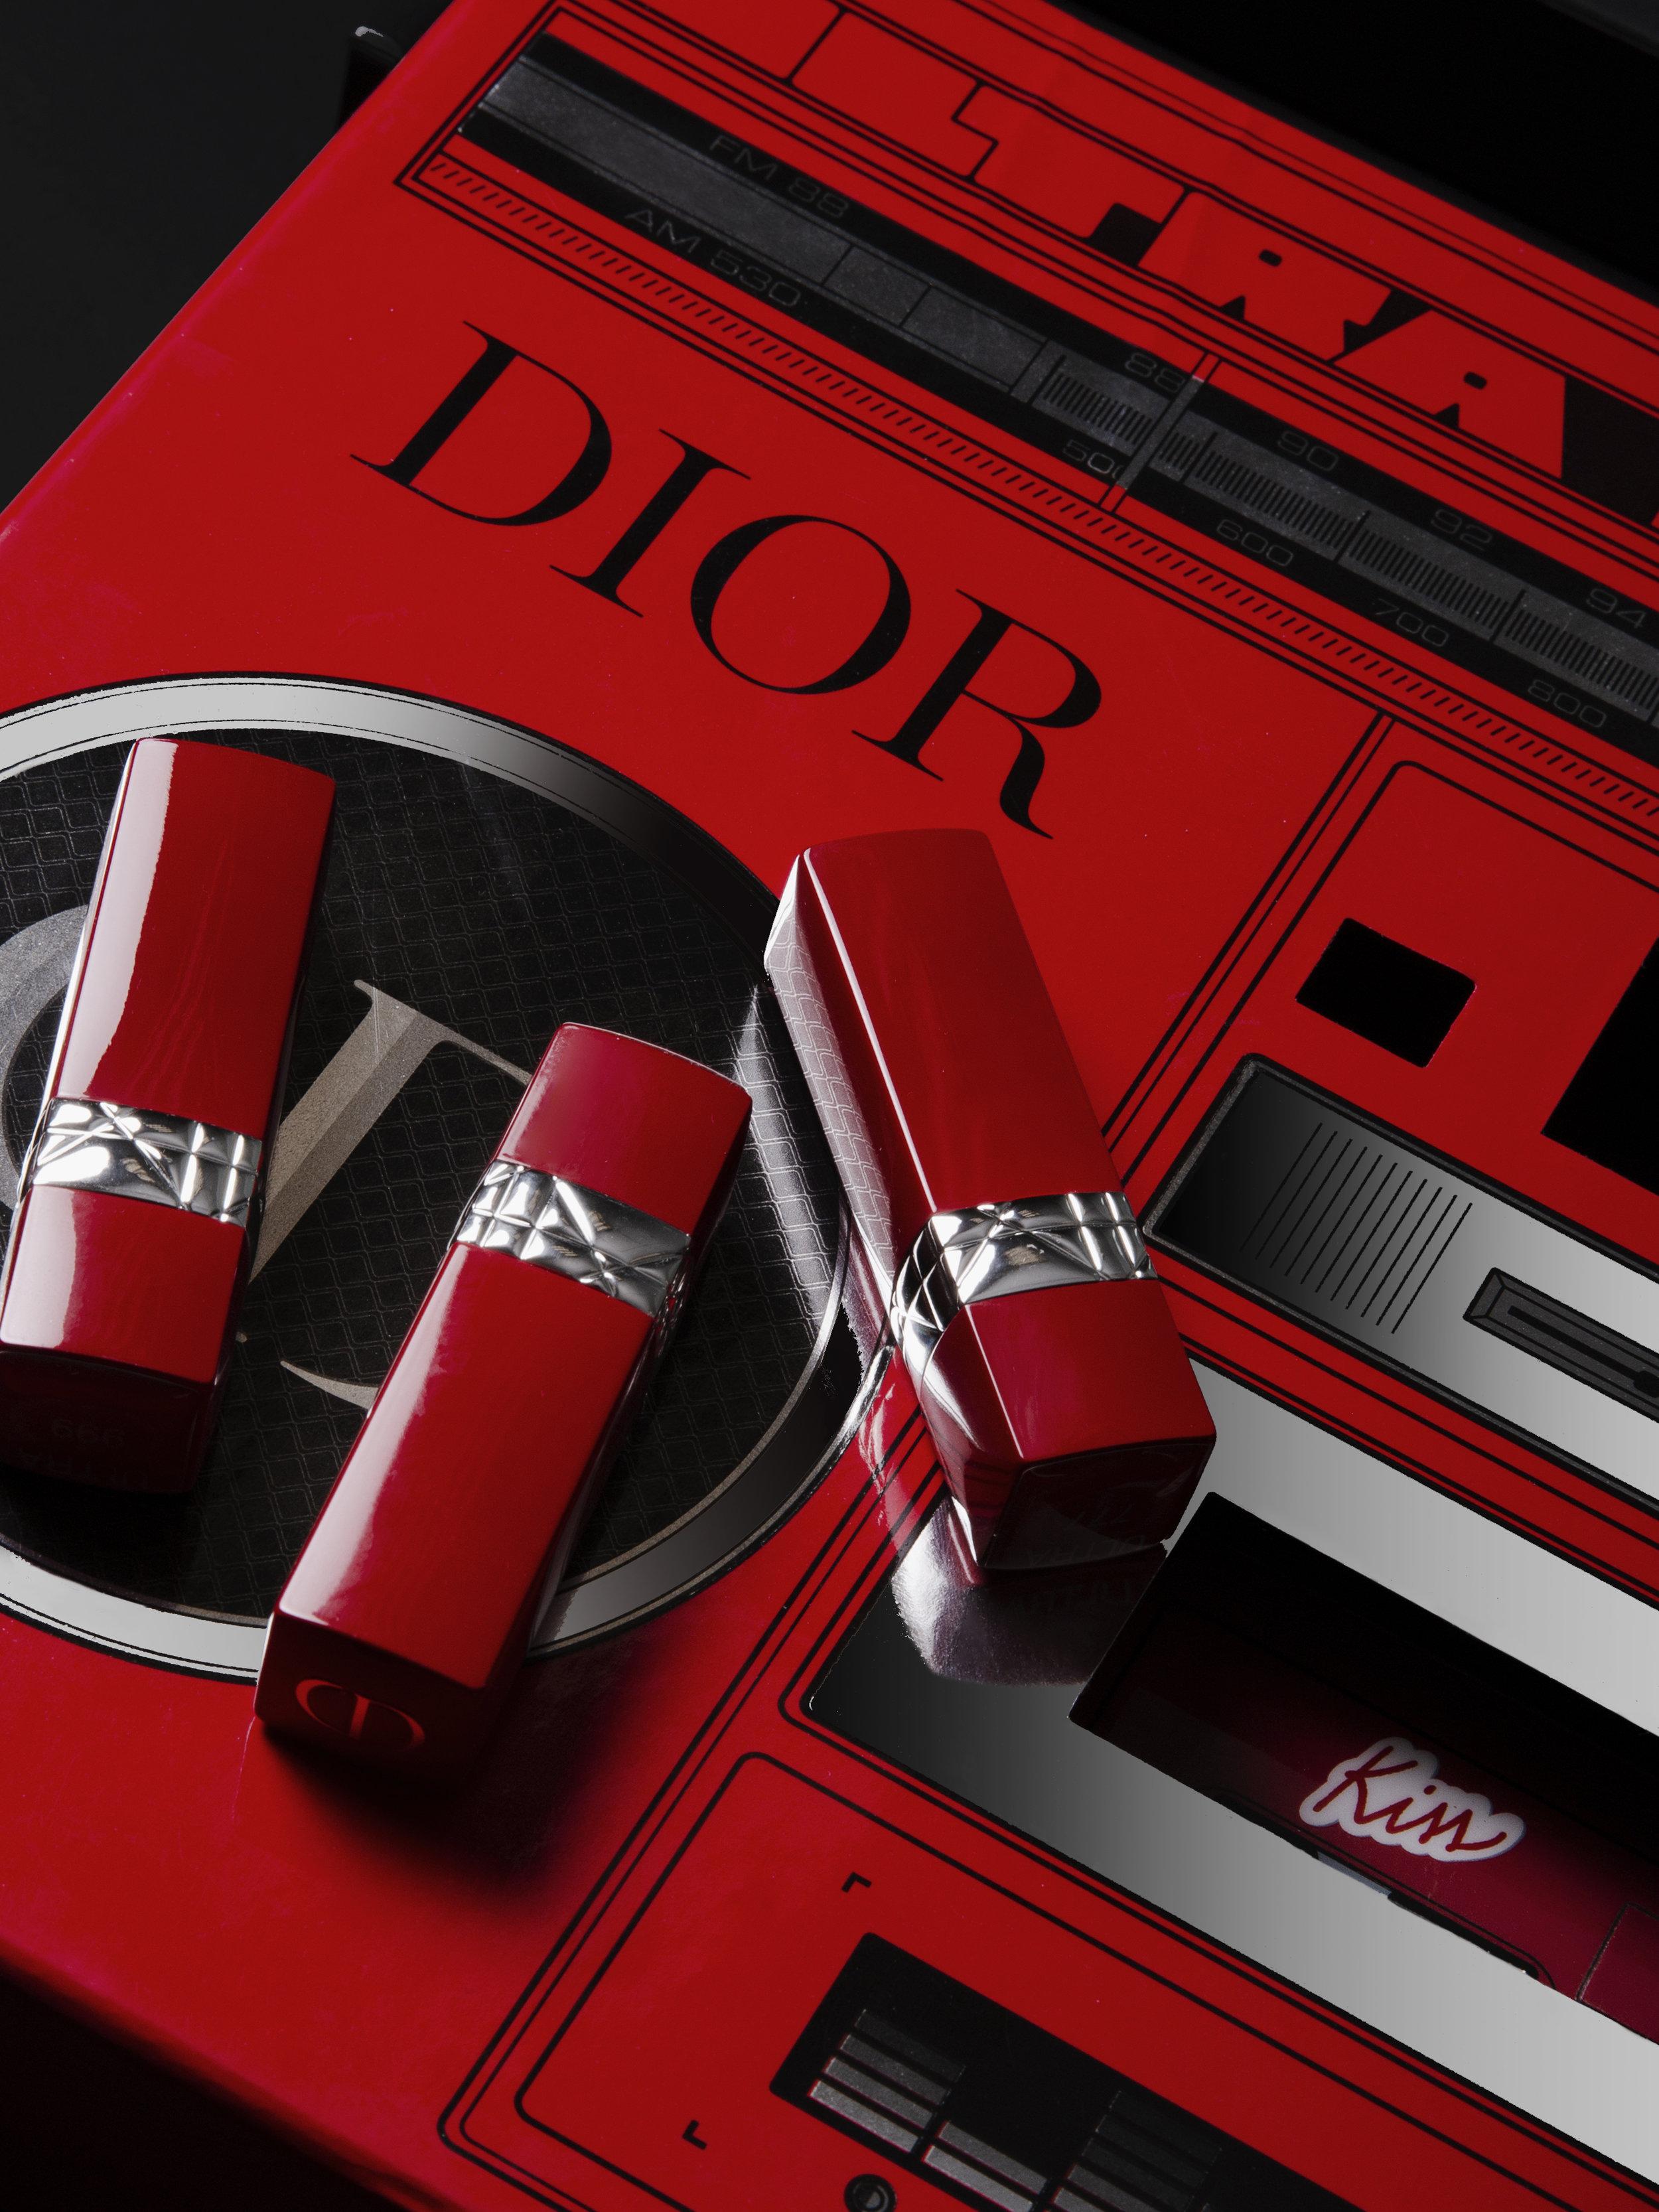 Desiree-DIOR_EXPORT_Product.jpg